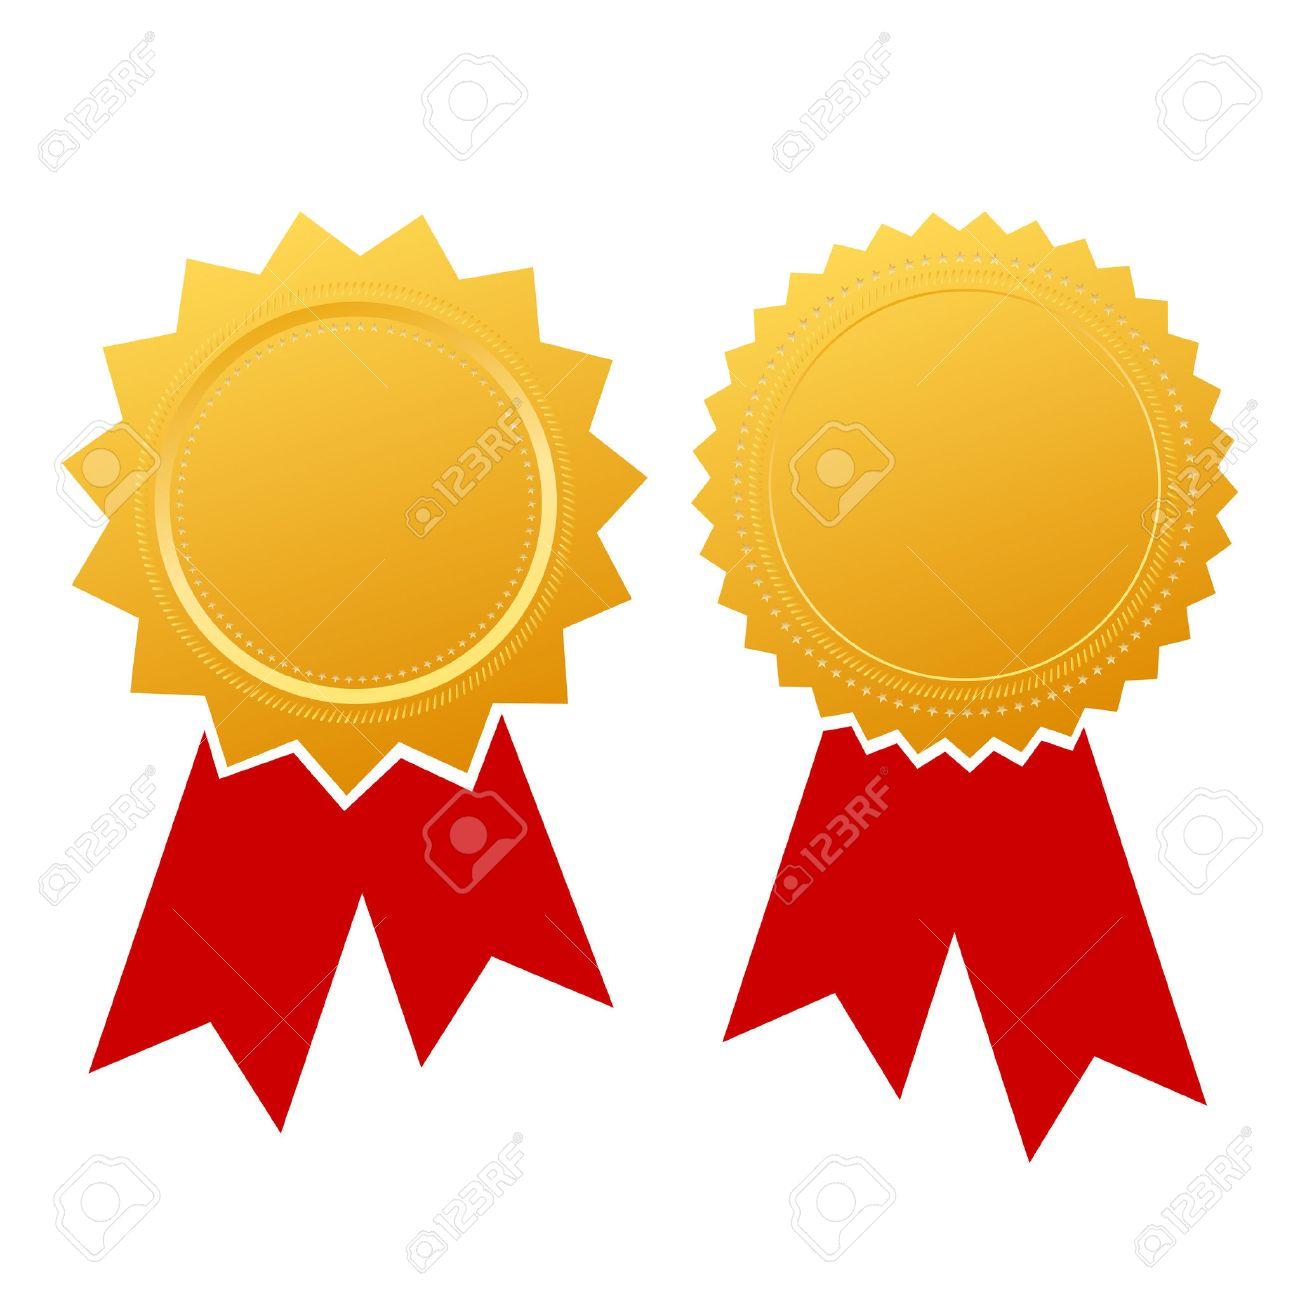 13657 award logo stock vector illustration and royalty free award blank ribbon certificate buycottarizona